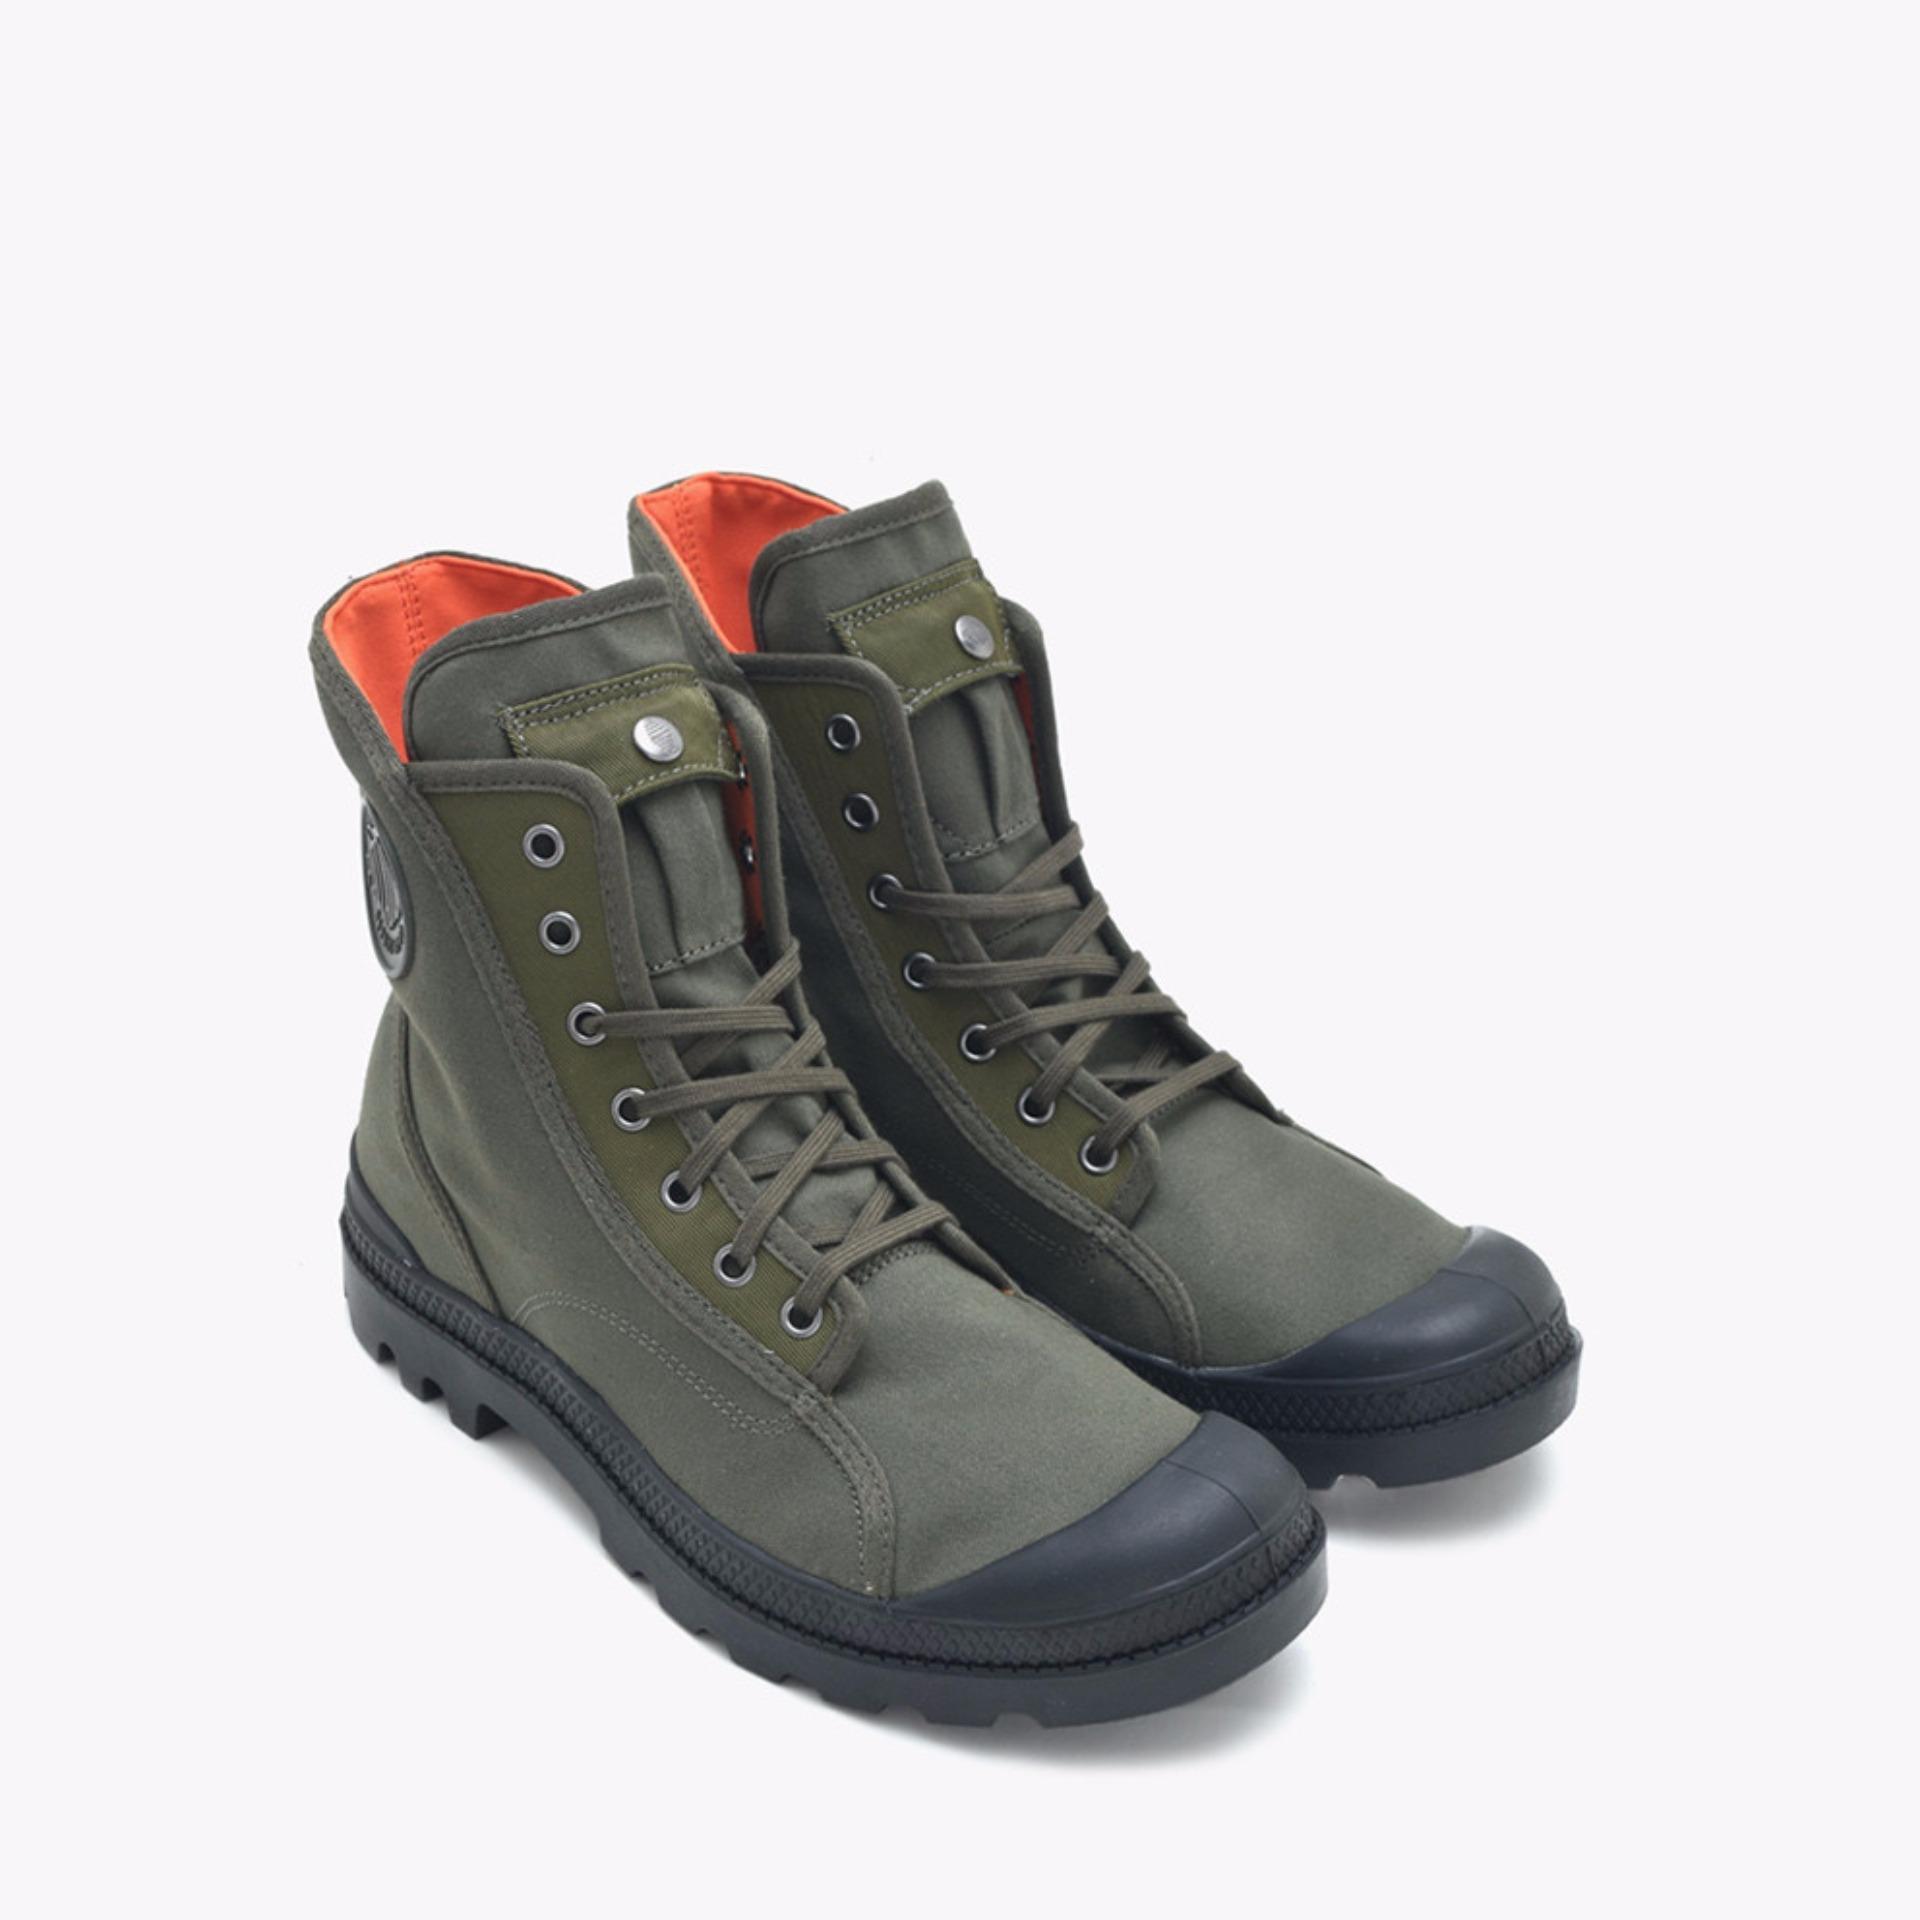 Pencarian Termurah Palladium Pampa M65 Hi-Army Green Black Flame ... 1b2f5edb0f